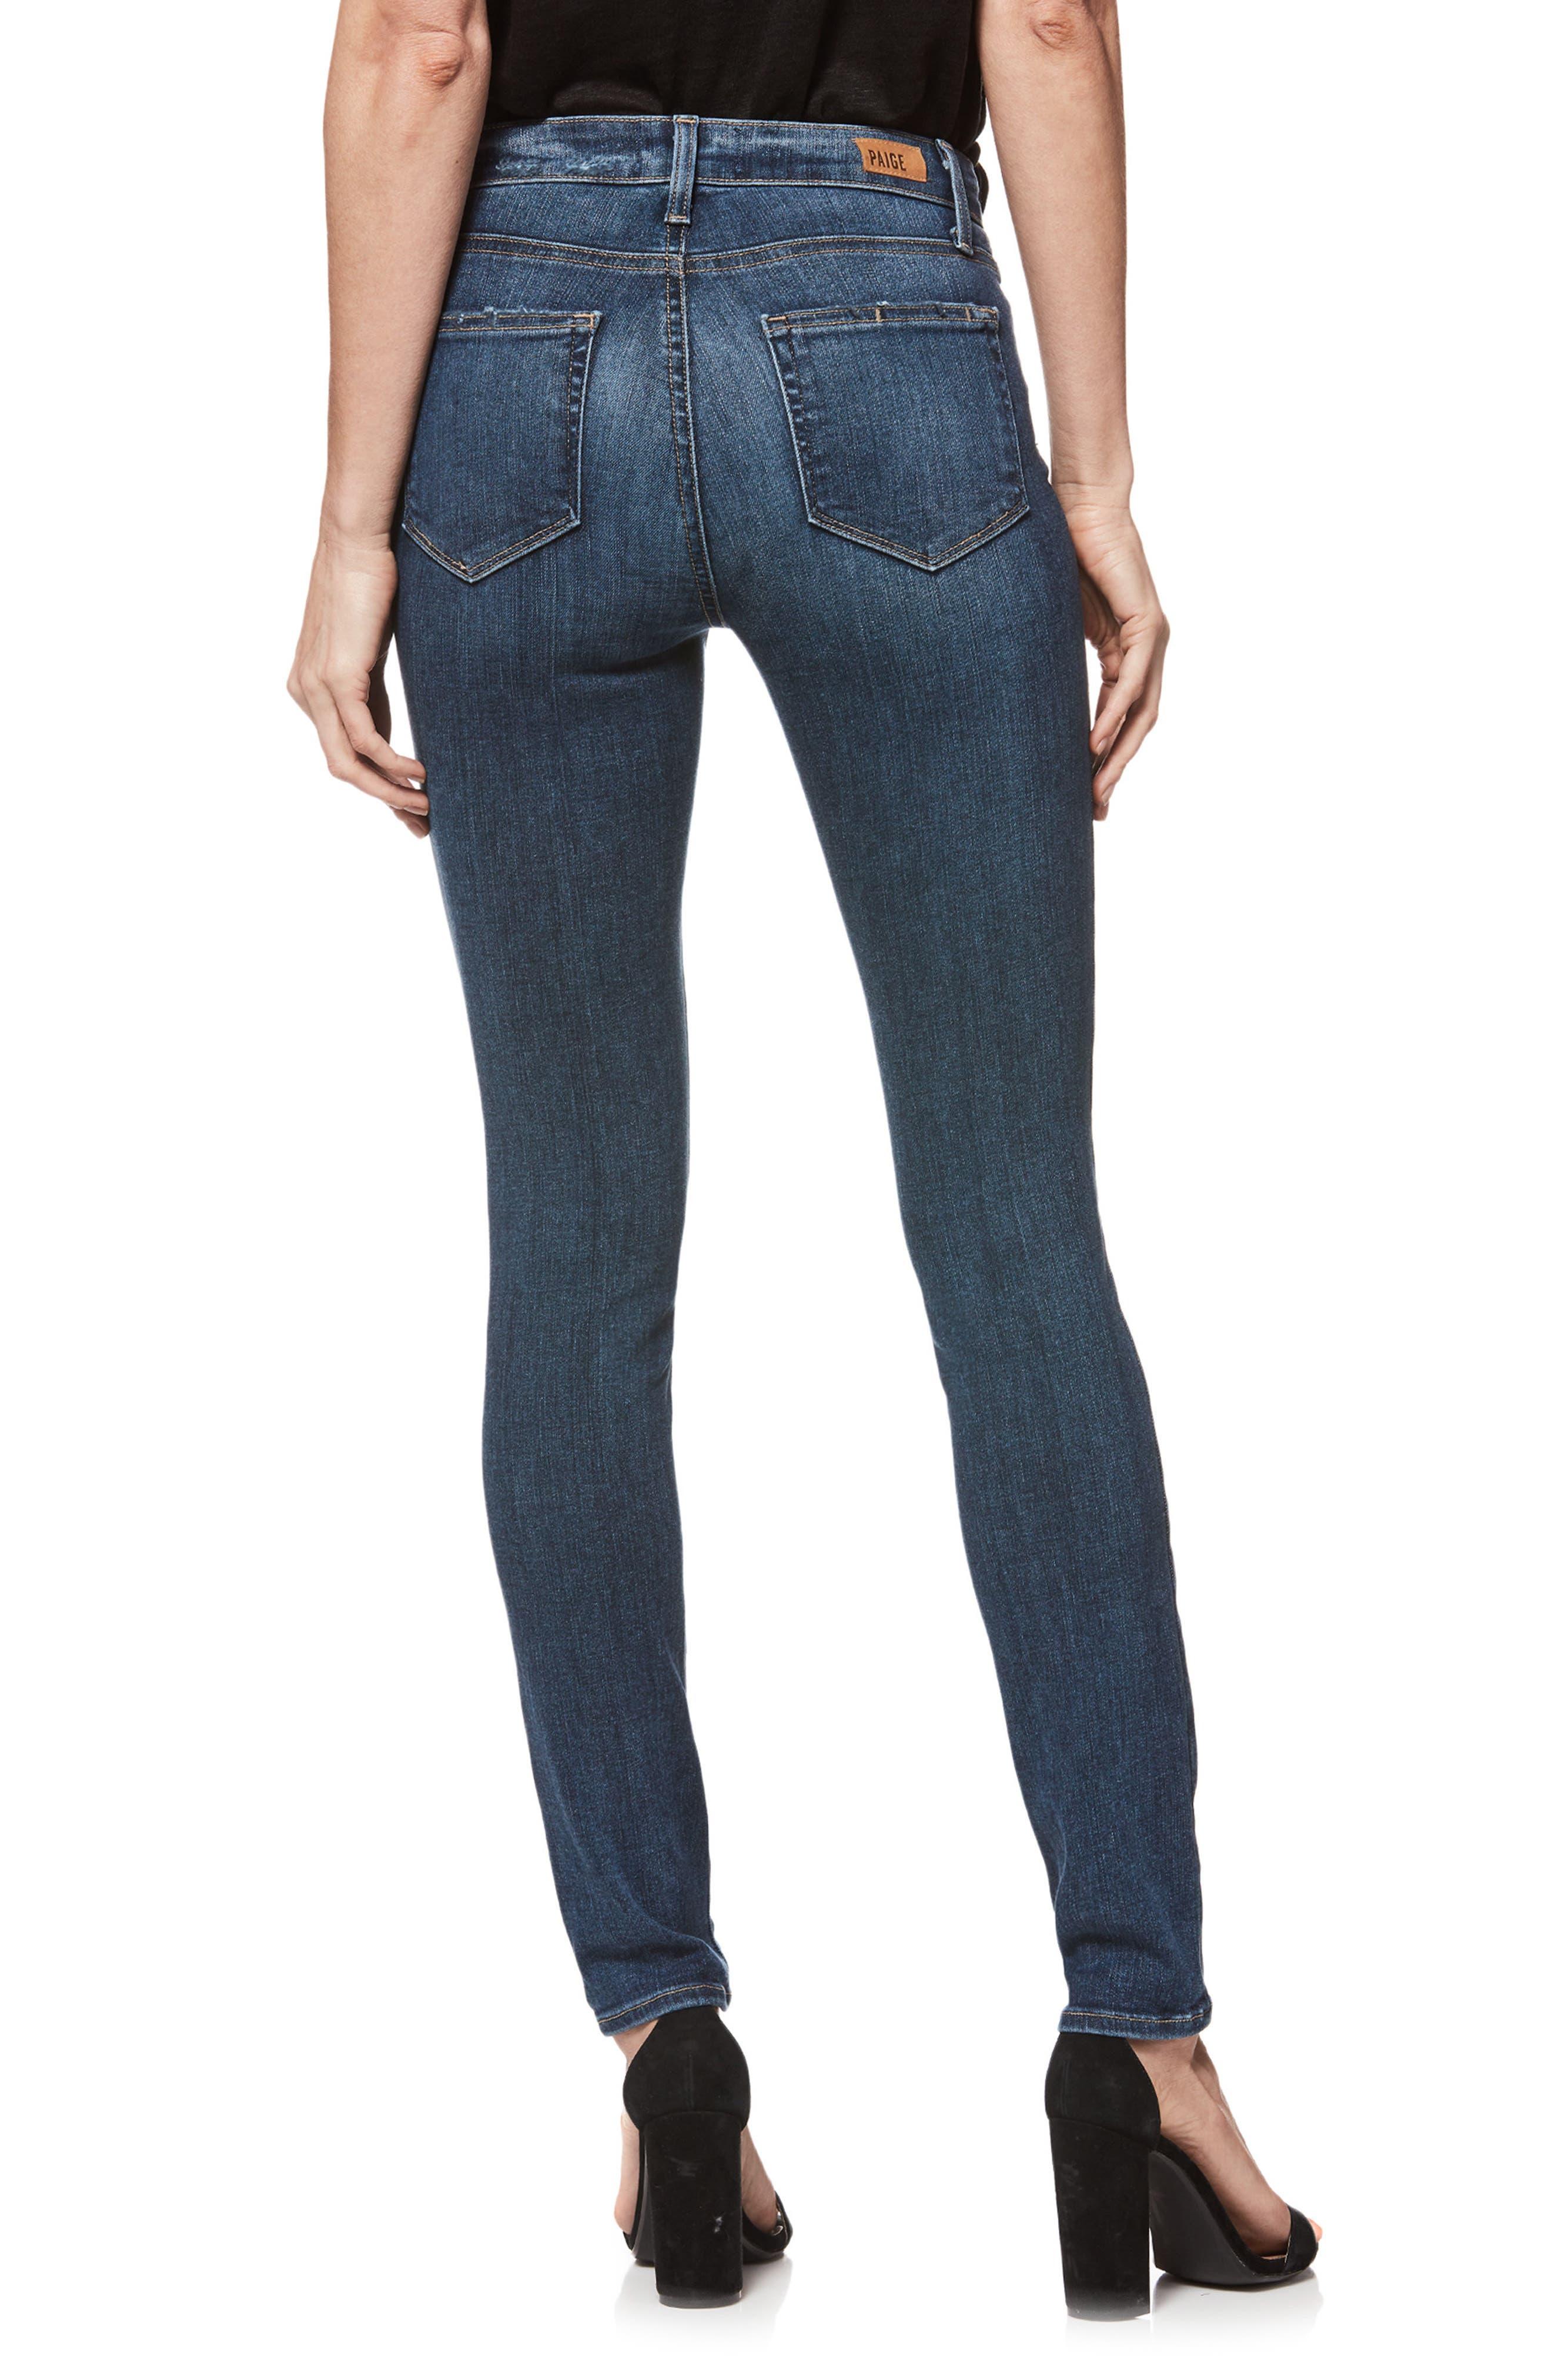 Transcend Vintage - Hoxton High Waist Ultra Skinny Jeans,                             Alternate thumbnail 2, color,                             400